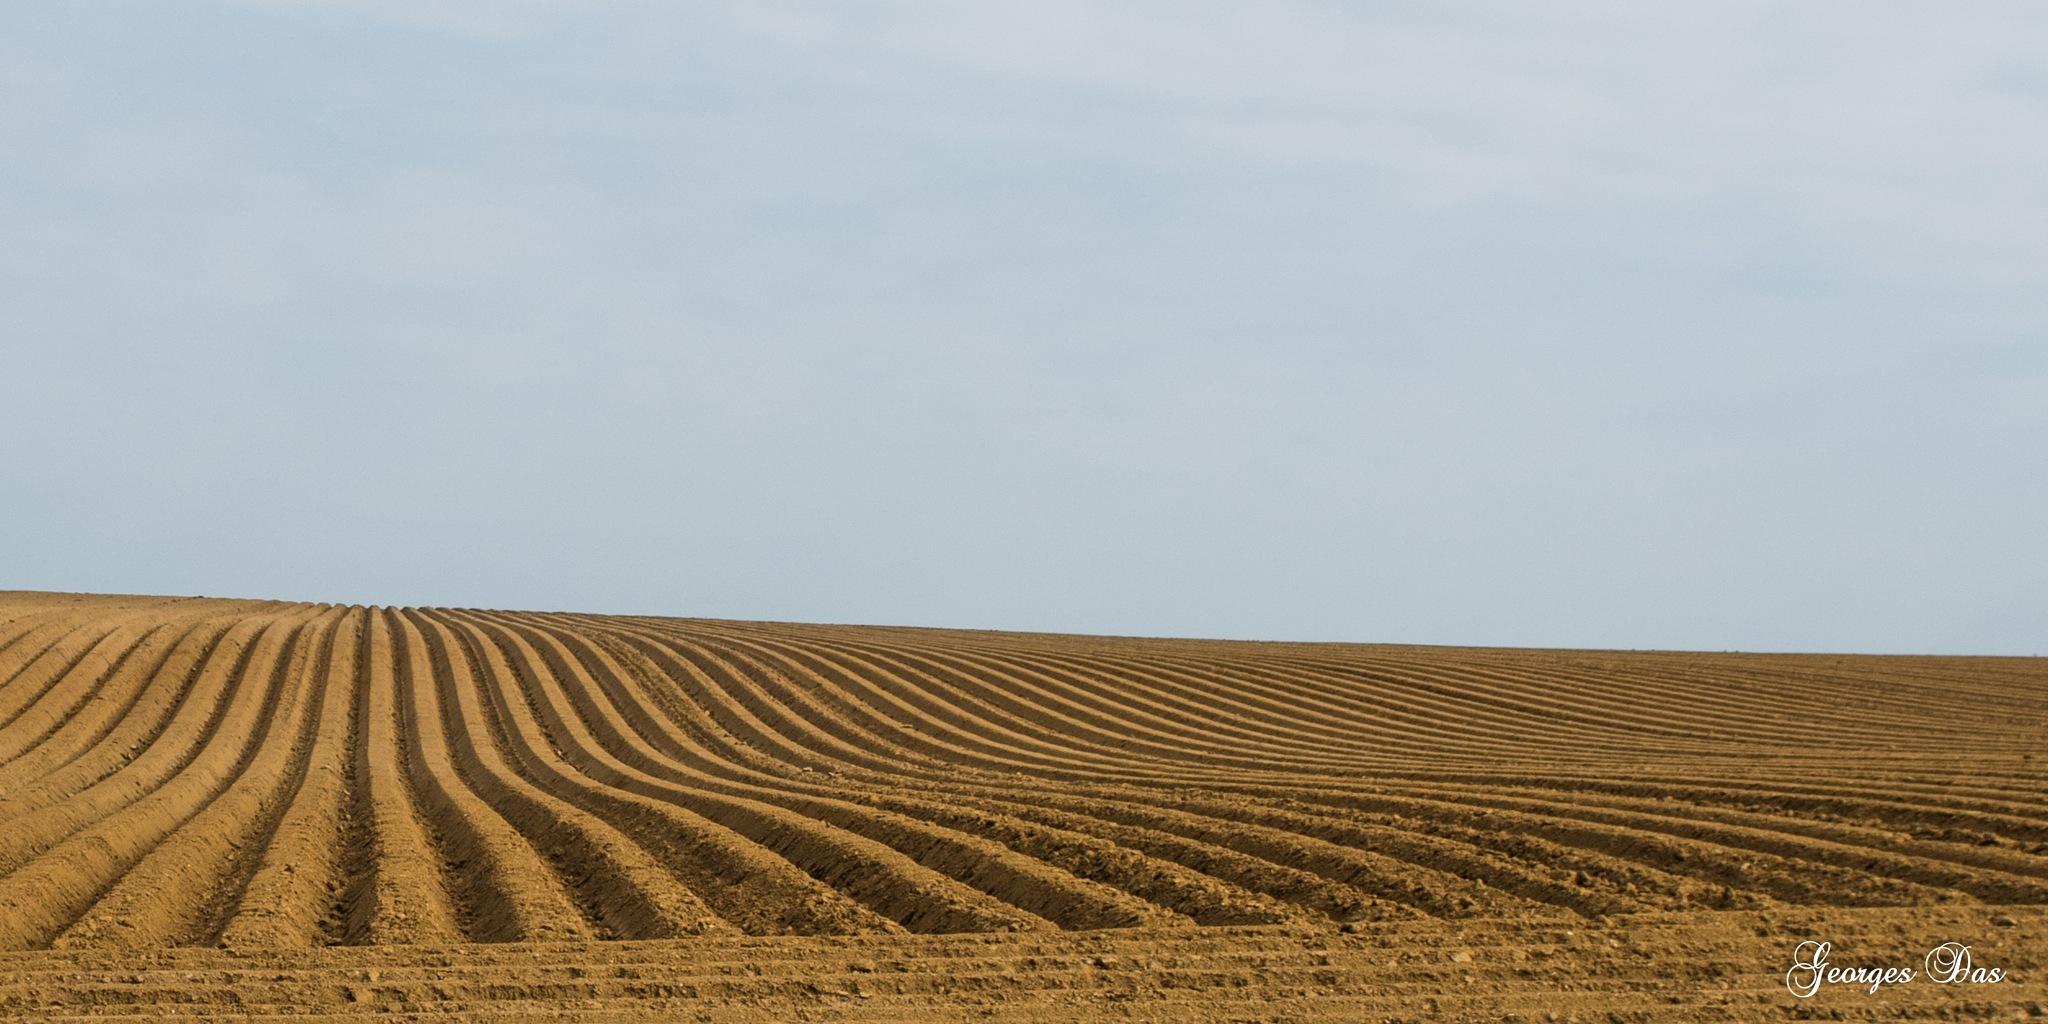 Field by Georges Das